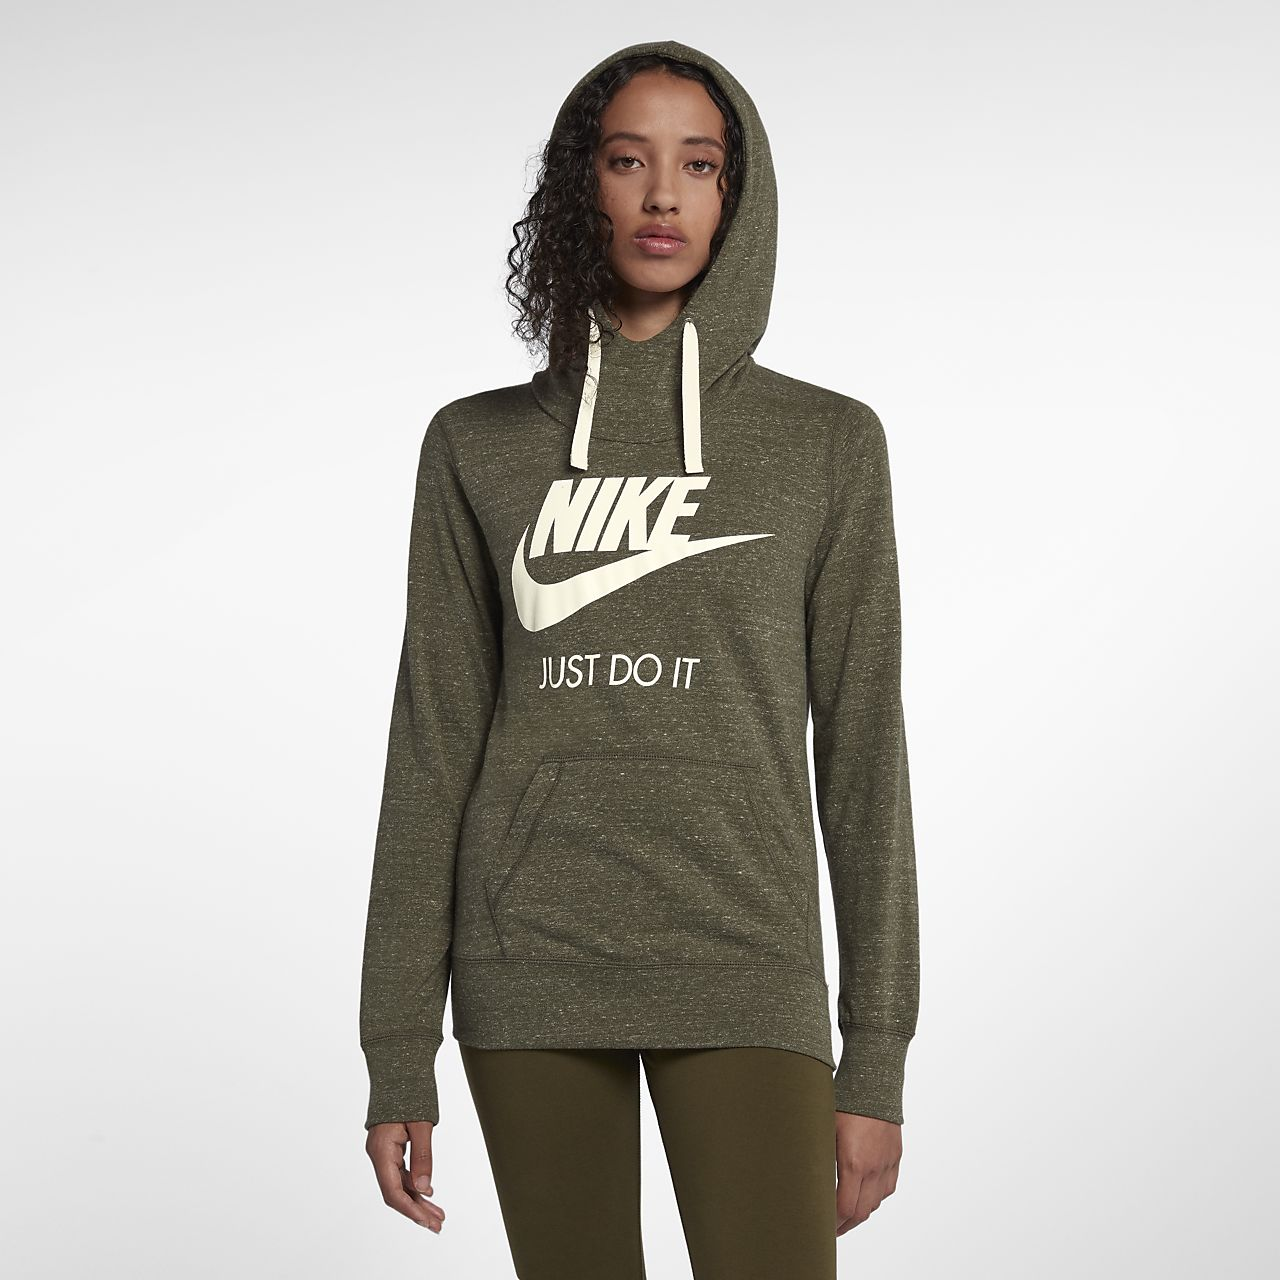 c052448087f4 Nike Sportswear Gym Vintage Women s Pullover Hoodie. Nike.com